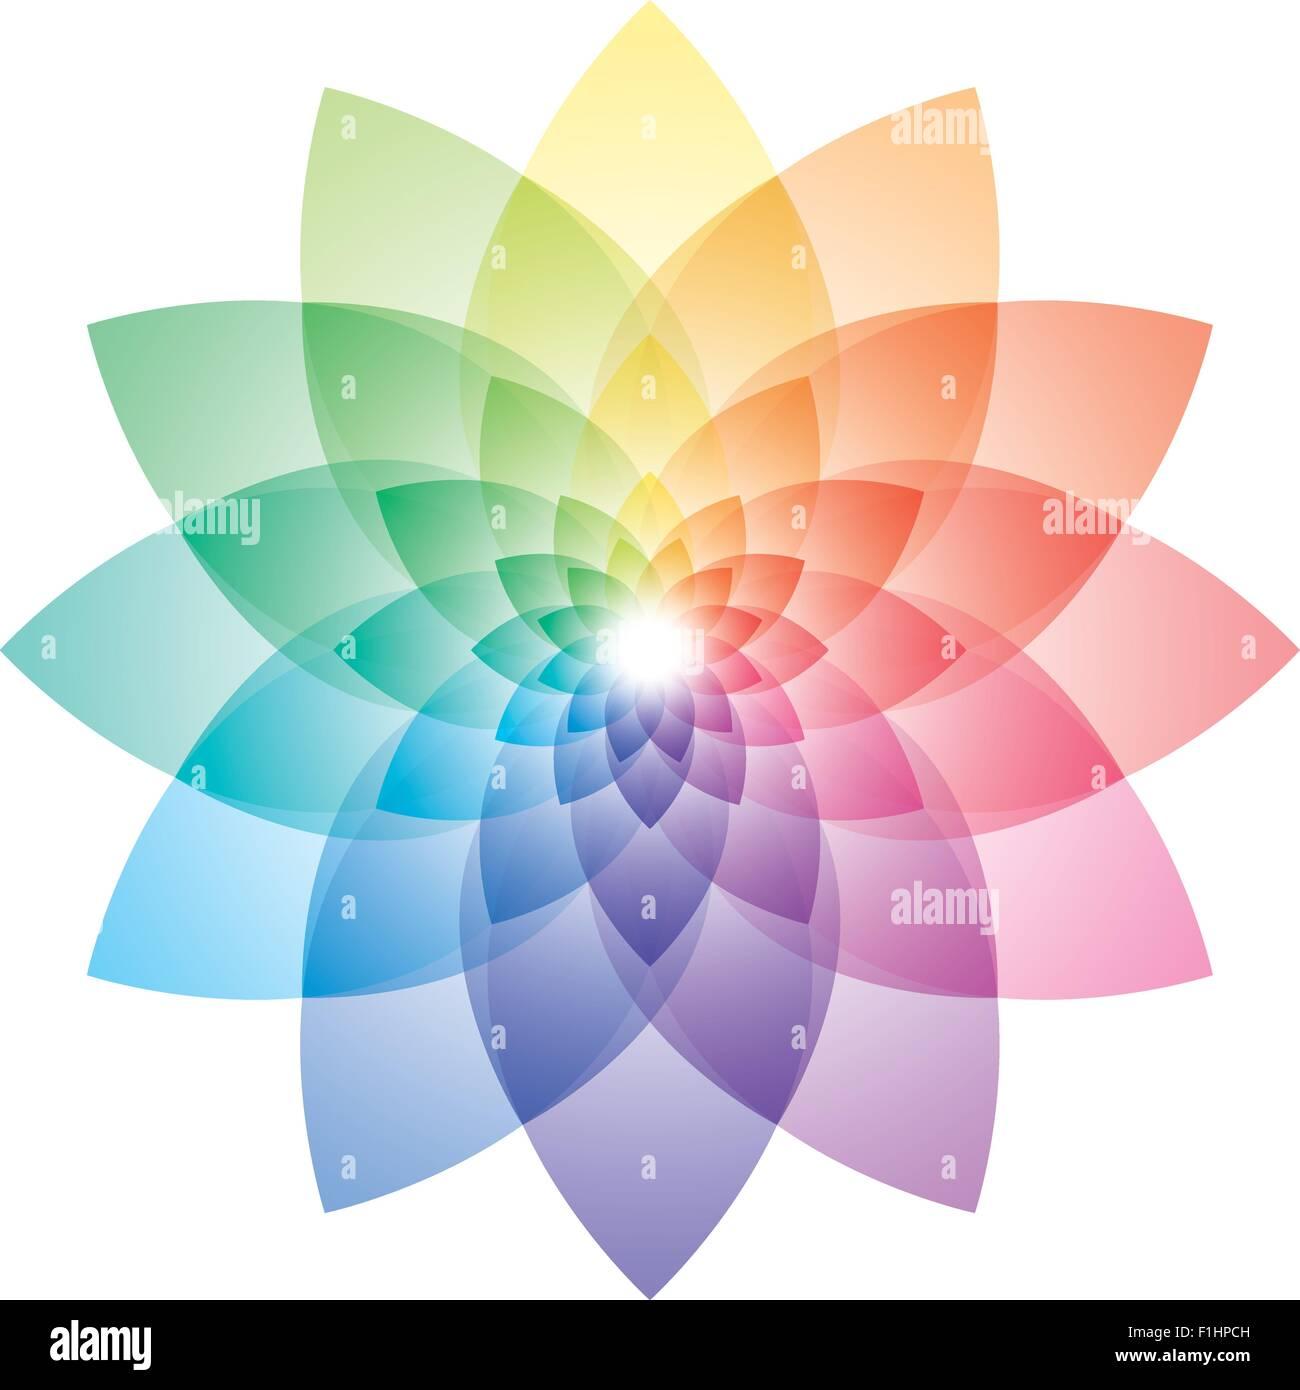 Beautiful Lotus Flower Color Wheel Vector Eps10 Stock Vector Art